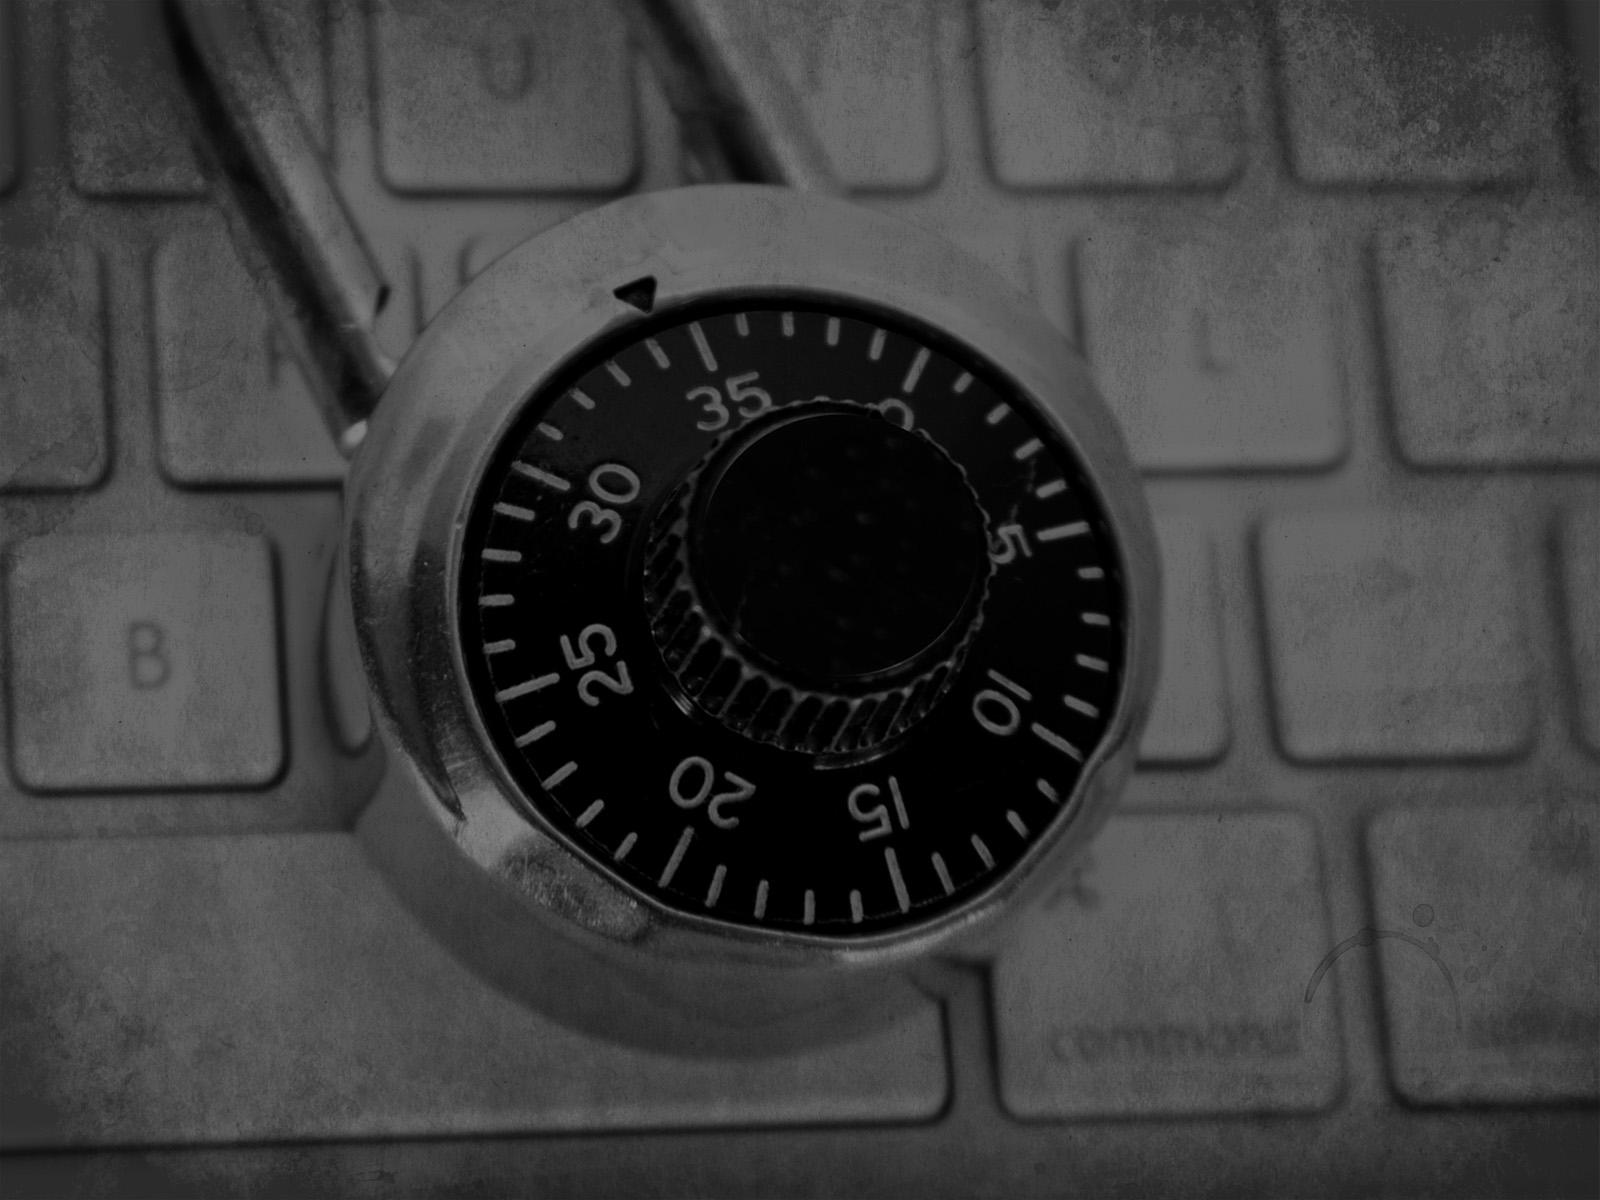 room with a clue maintenance bg05